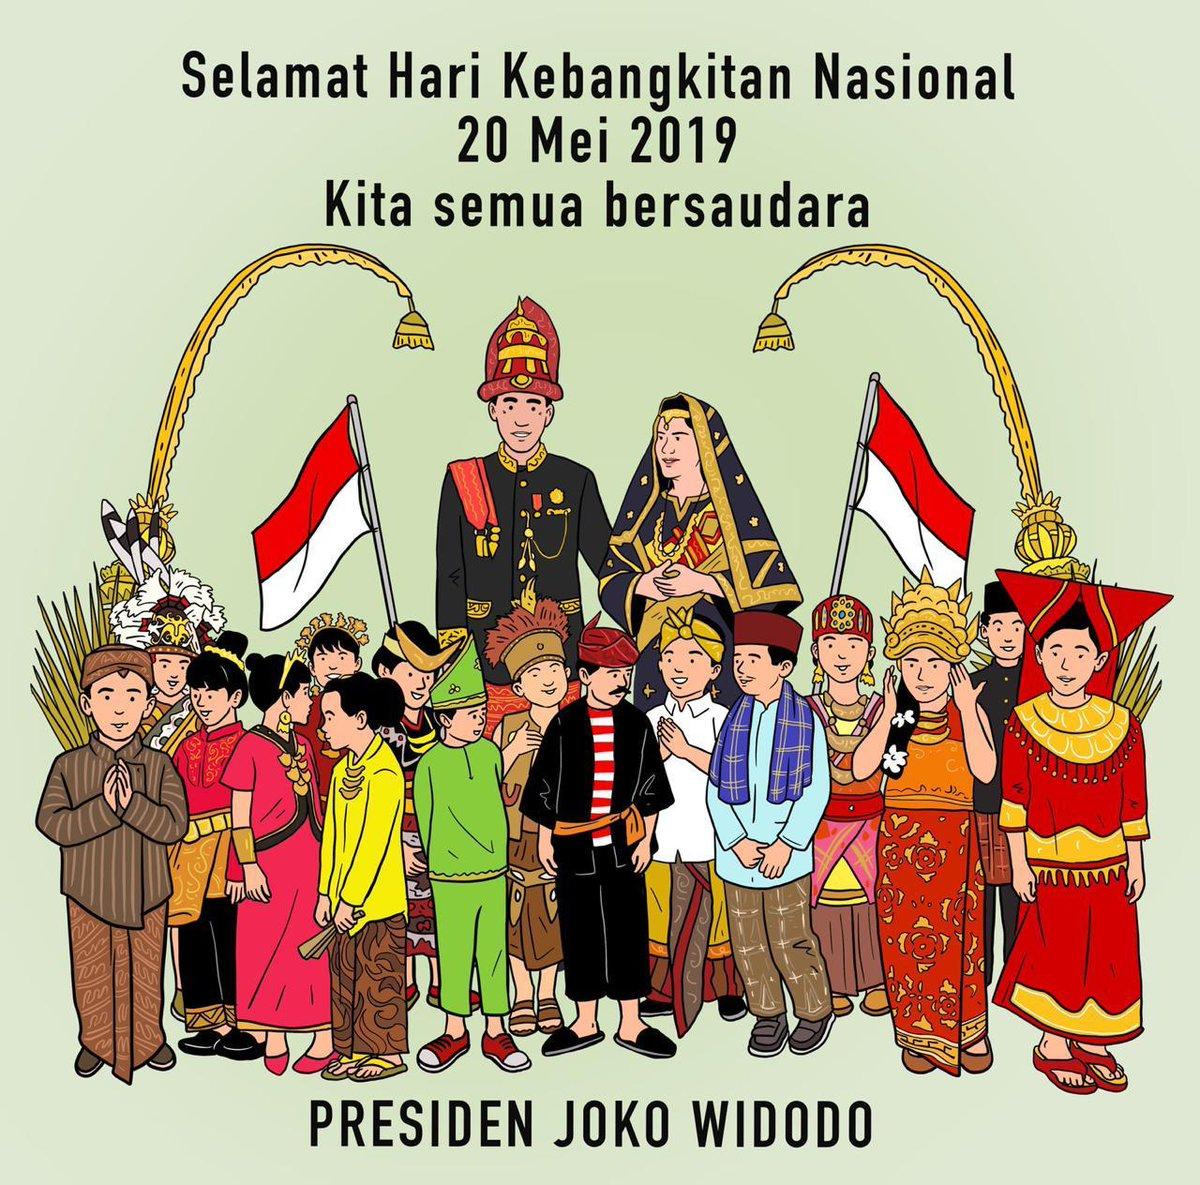 111 tahun lalu, para pemuda menolak terlelap dalam keterbelakangan. Mereka bangkit, memperkuat diri, mendirikan Budi Utomo, dll.Kebangkitan itu kita peringati kini dengan tekad baru: membangun Indonesia yang maju, yang sanggup mengelola perbedaan, damai dan tanpa kekerasan.